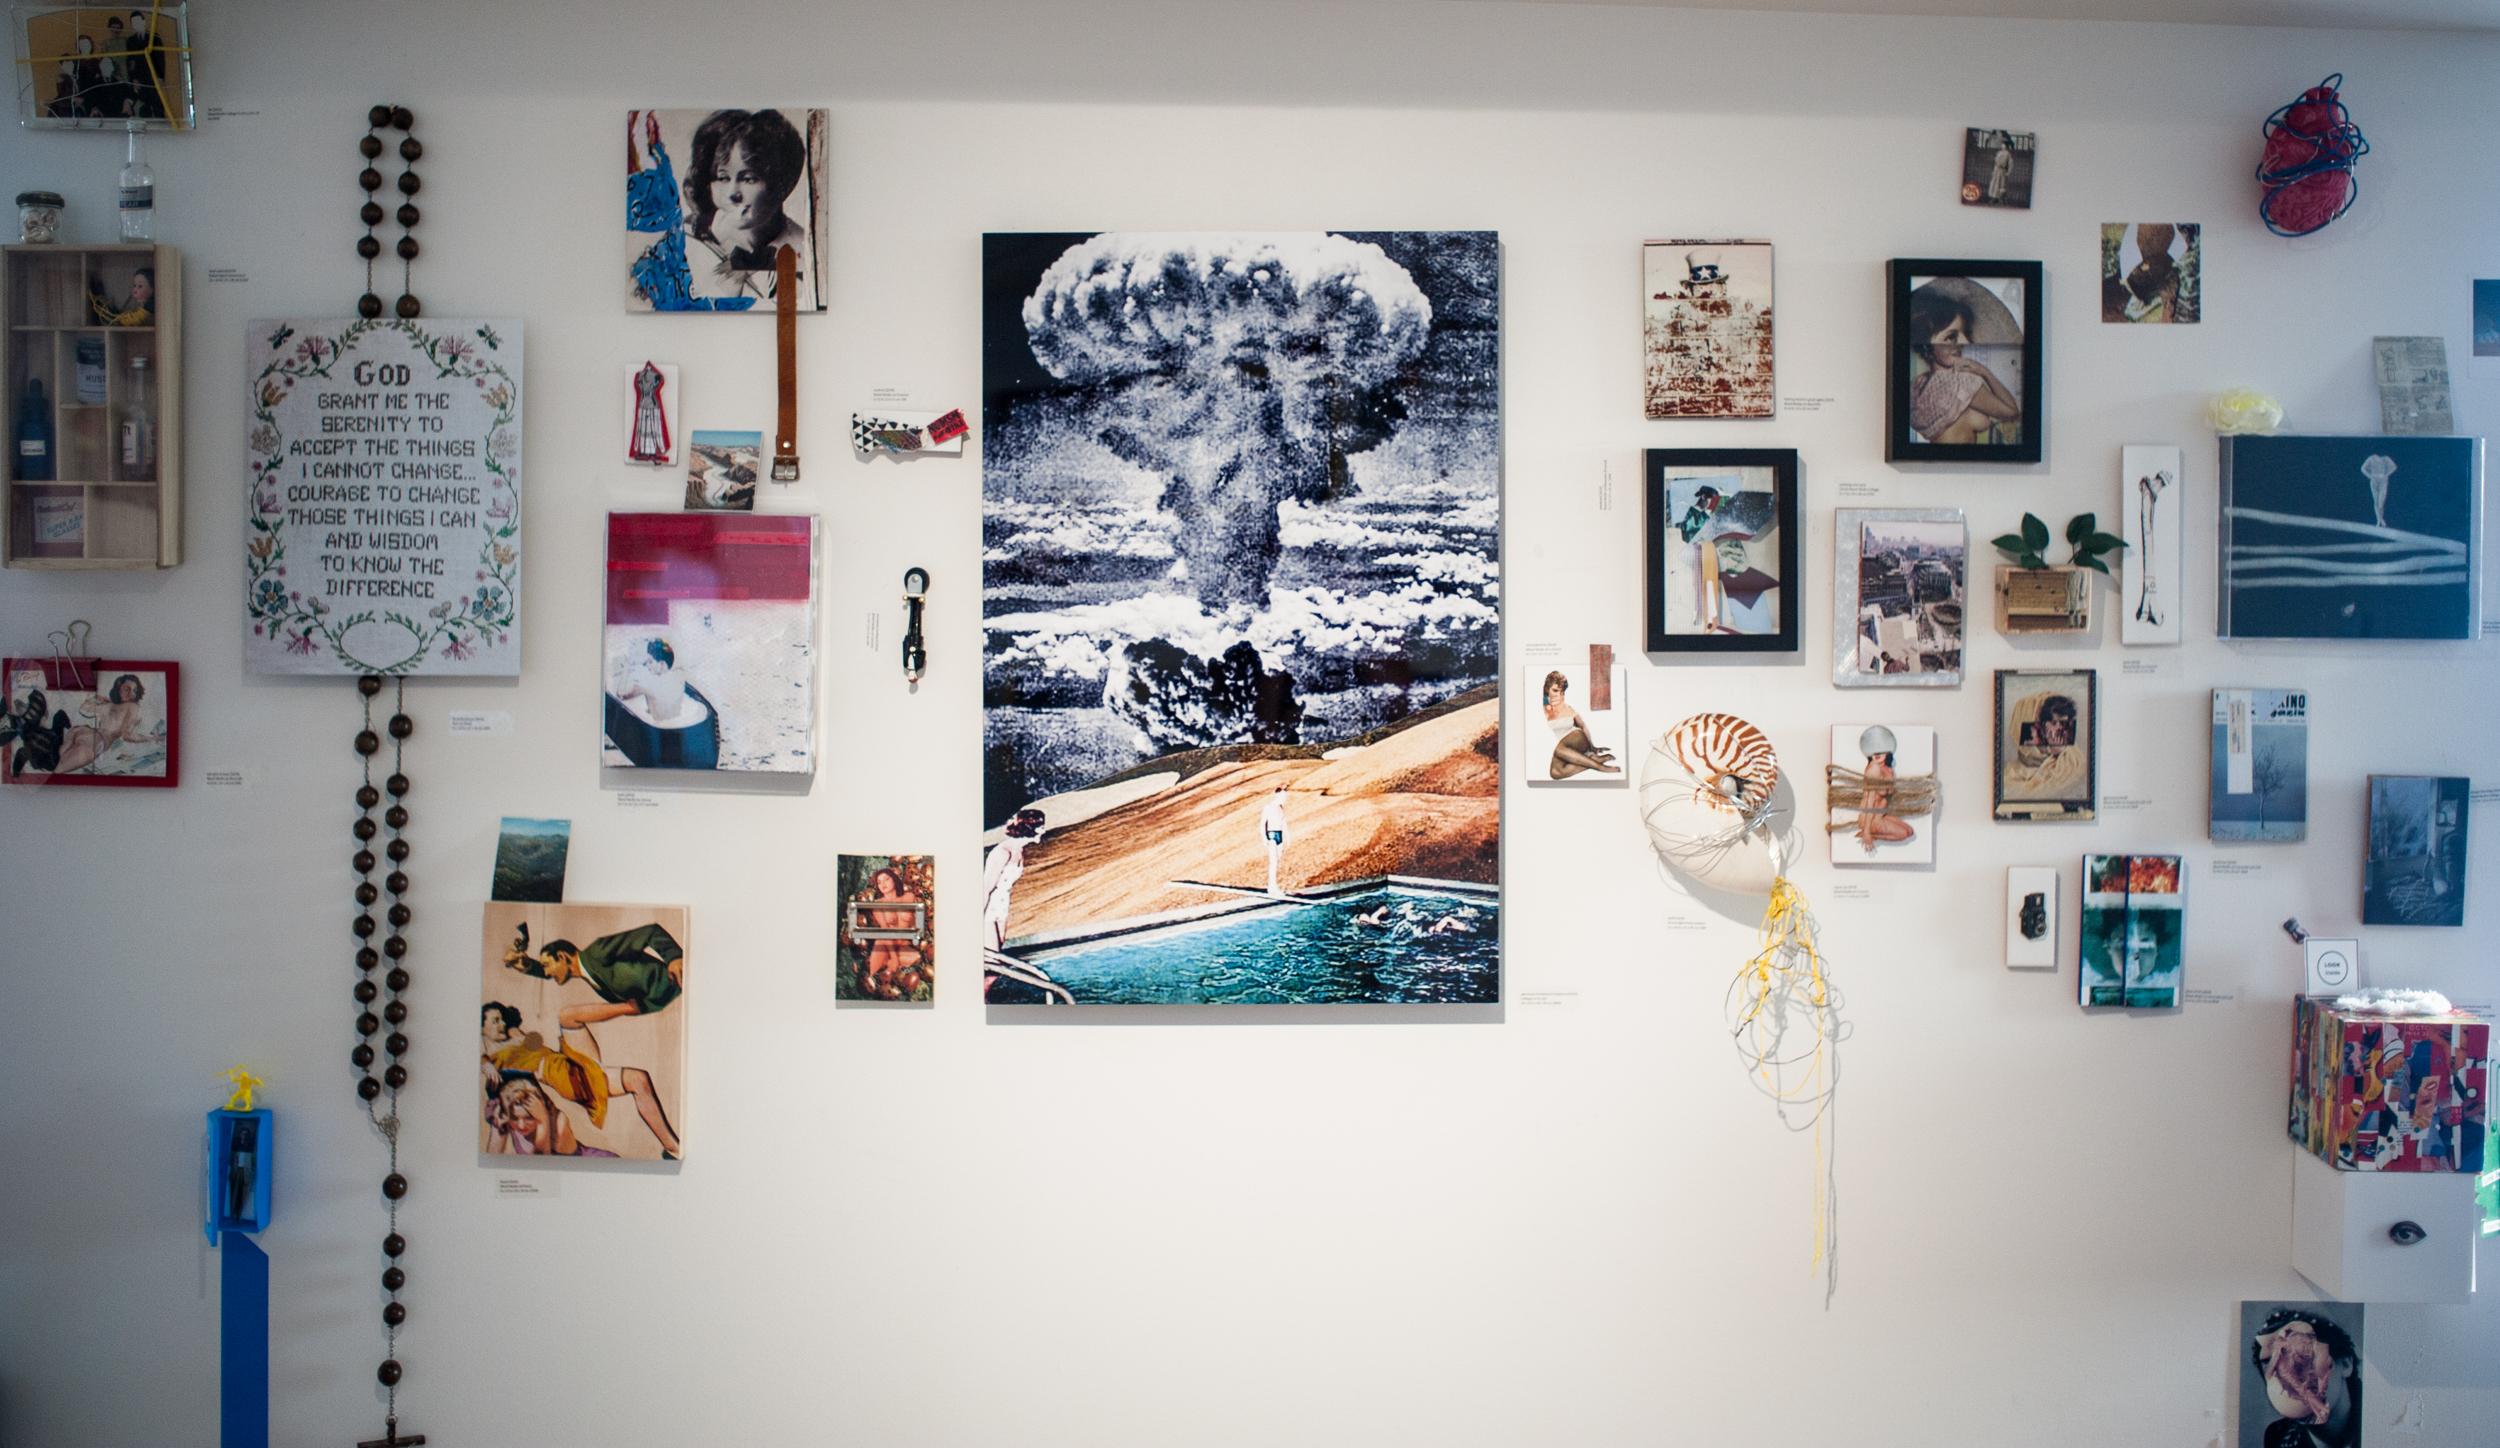 Faena-Exhibition-Images-22.jpg